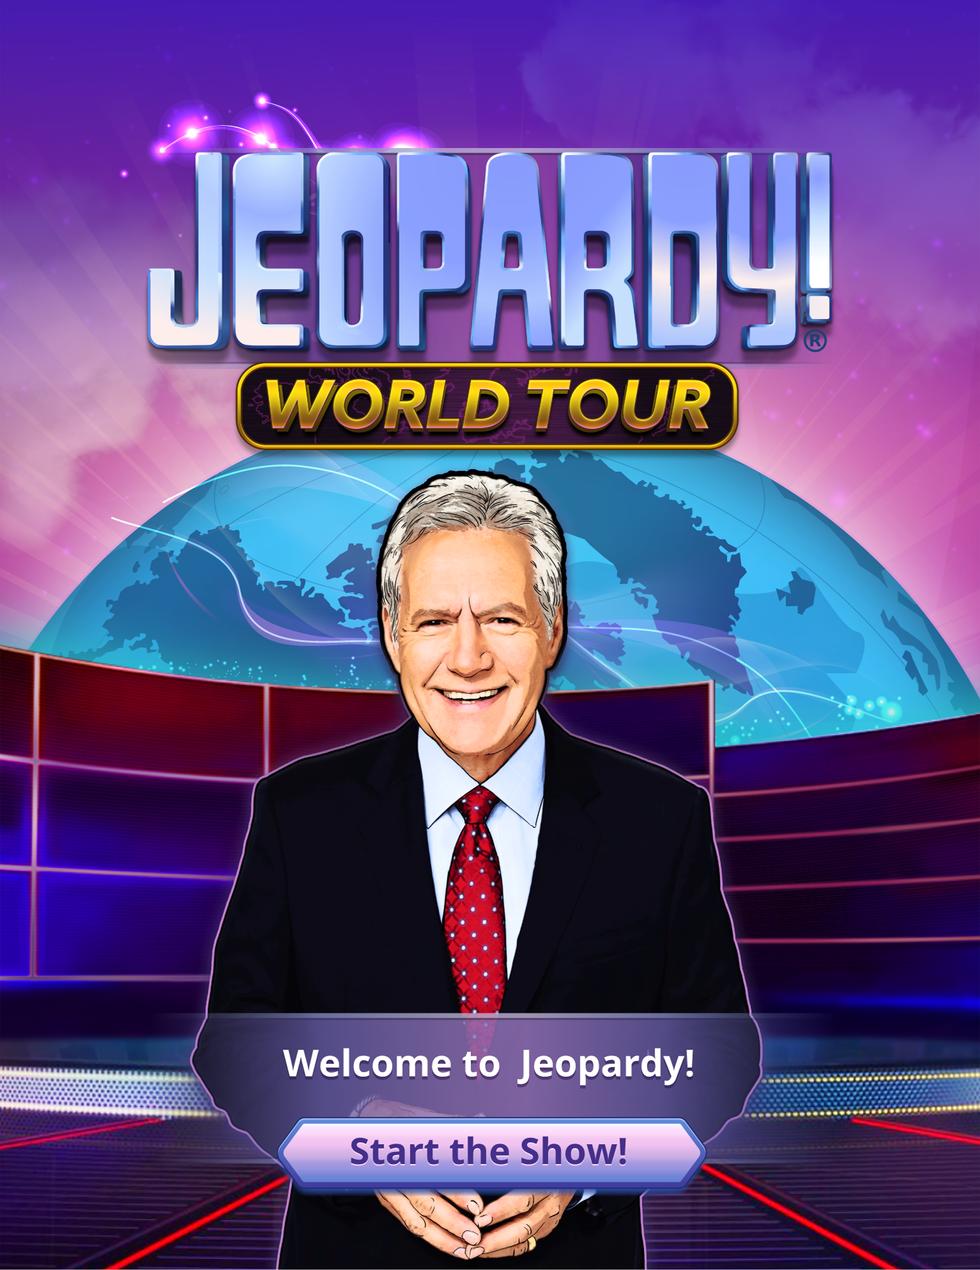 JeopardyWorldTourBehance01.png